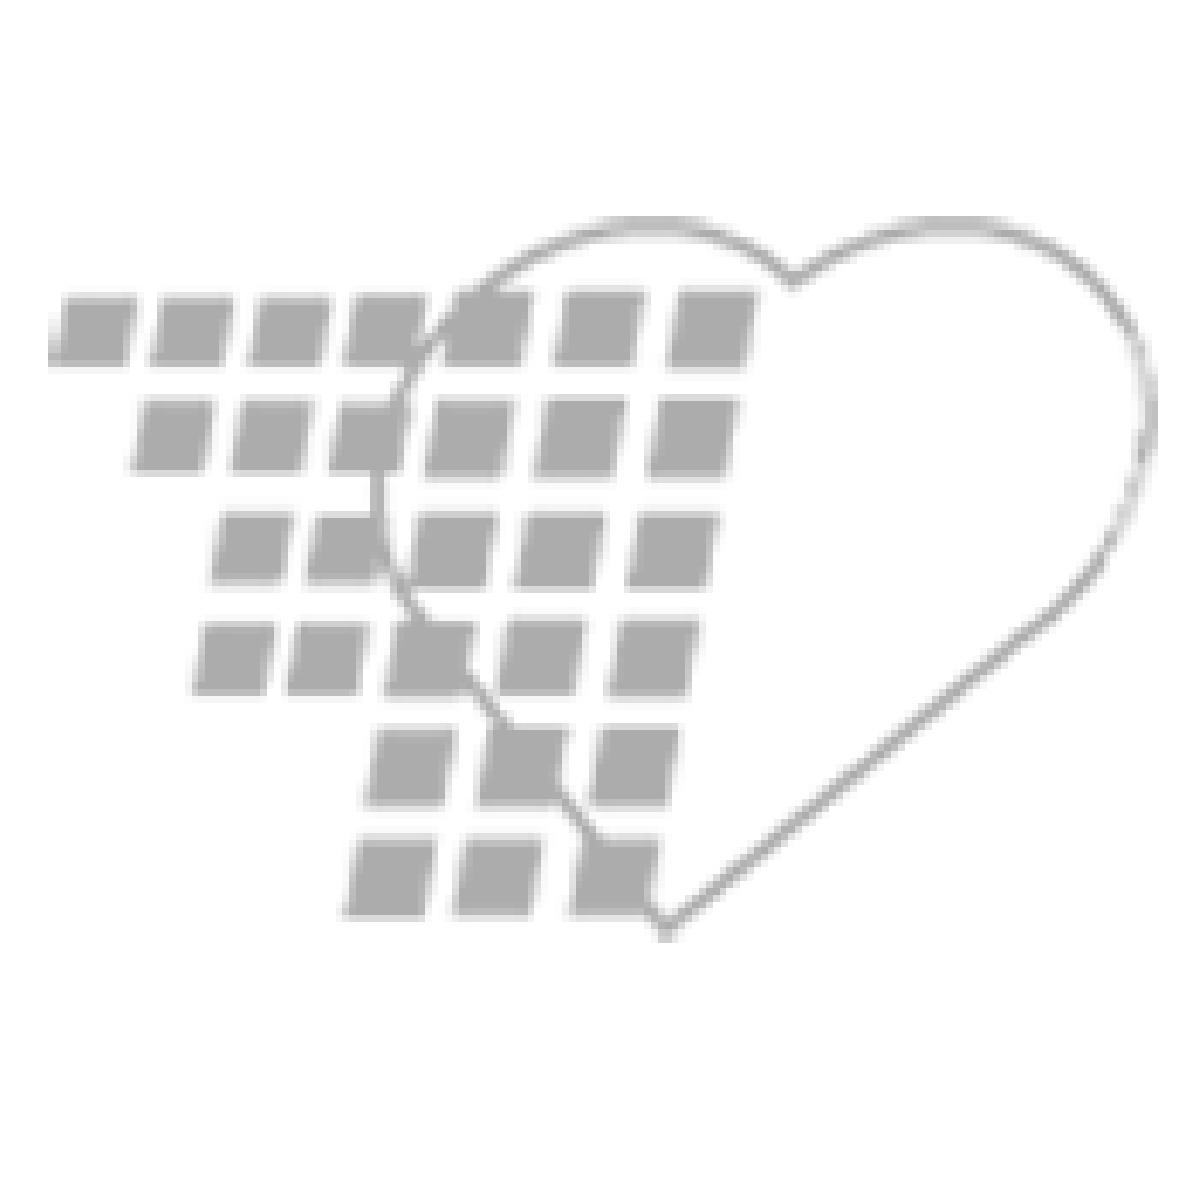 06-93-3122 Demo Dose® Dantrolen Sodim (Ryanodx) 250 mg (50mg/mL)